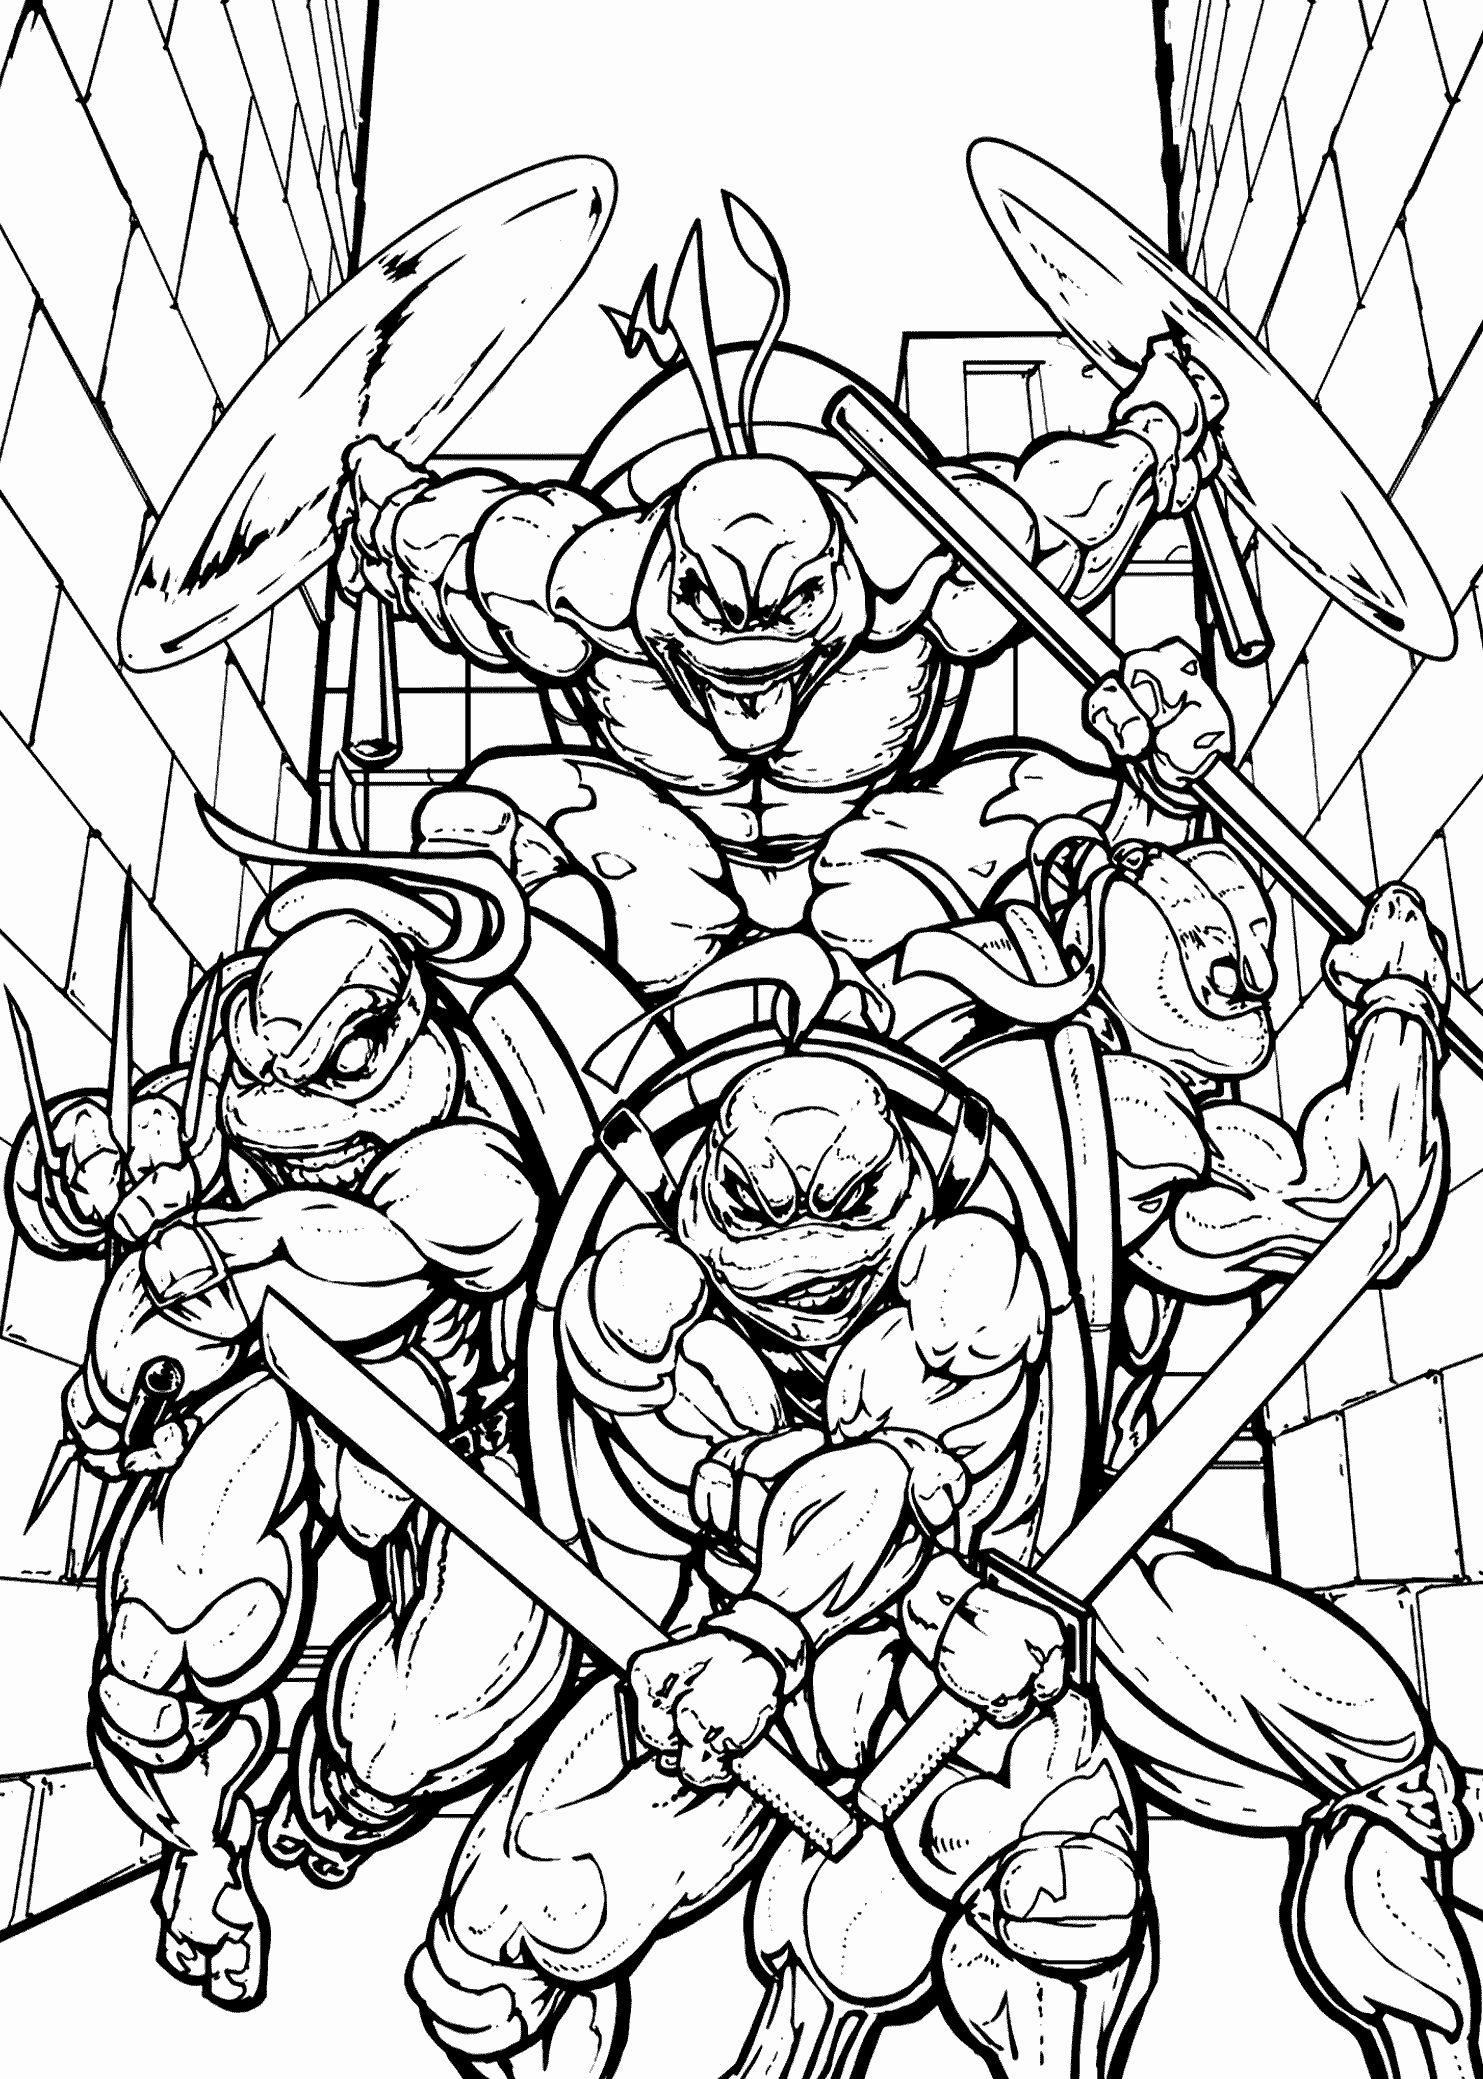 Teenage Mutant Ninja Turtles Coloring Page Lovely 39 Printable Teenage Mutant Ninja Turt Dibujos Animados Para Dibujar Batman Para Colorear Sonic Para Colorear